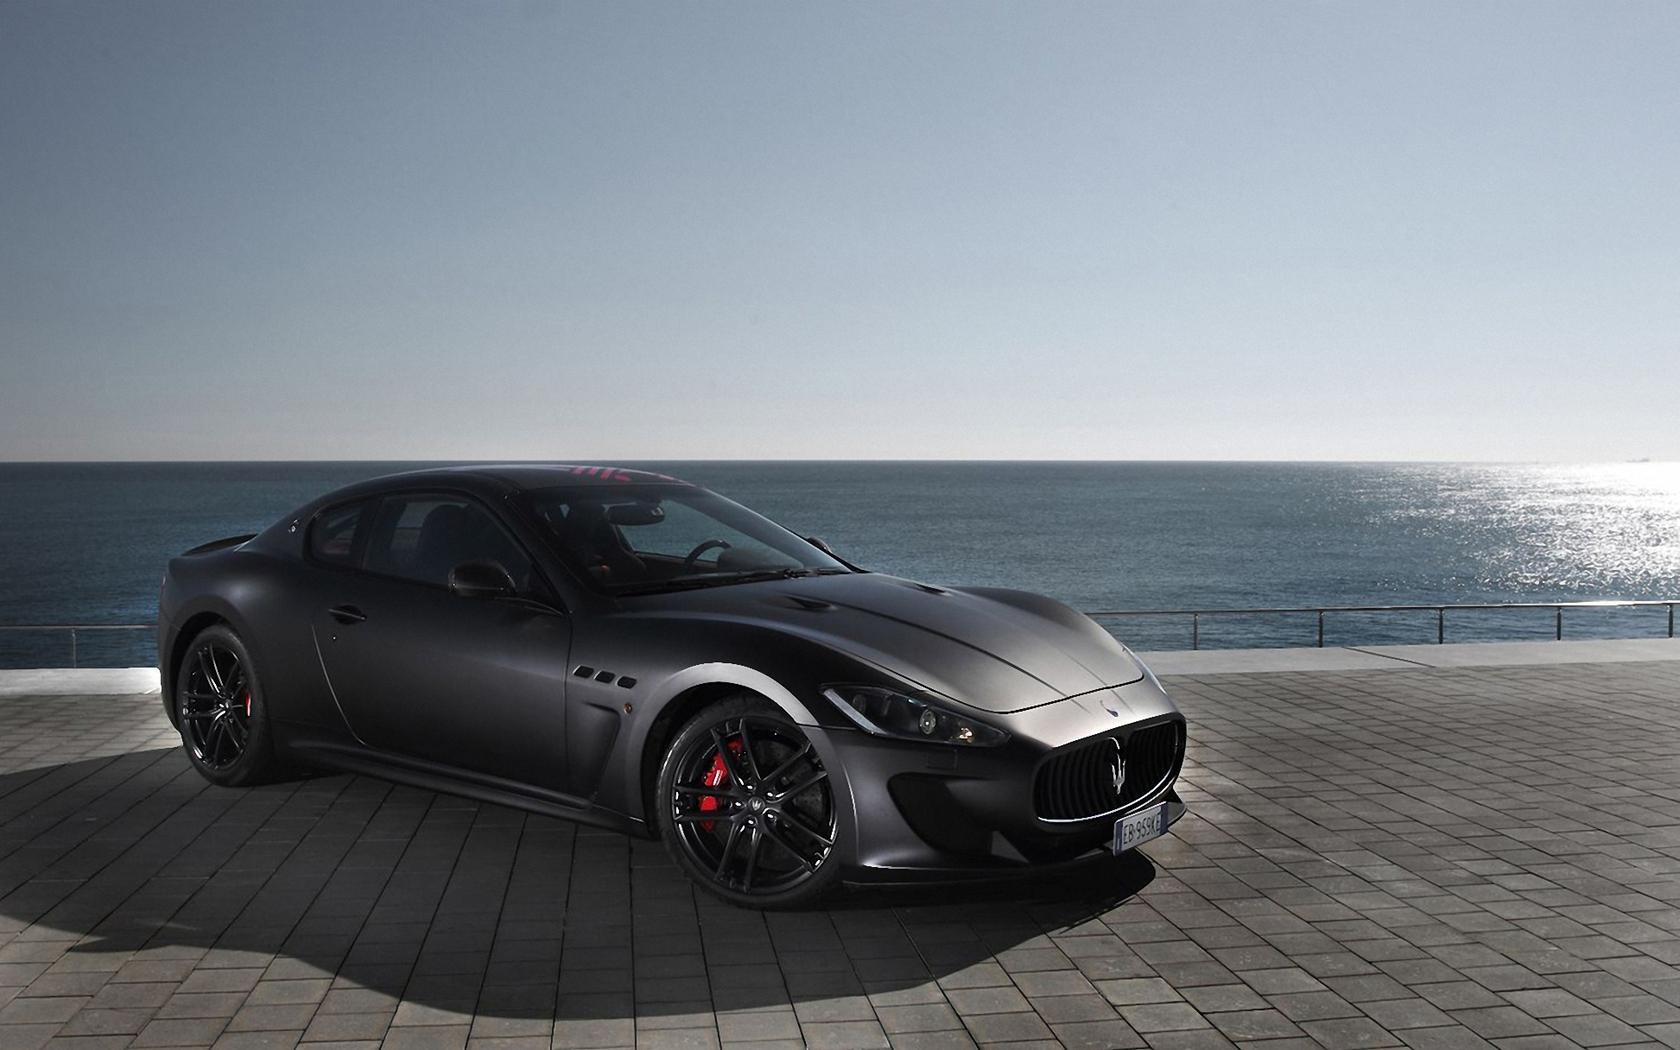 Maserati Wallpaper and Background Image 1680x1050 ID375641 1680x1050